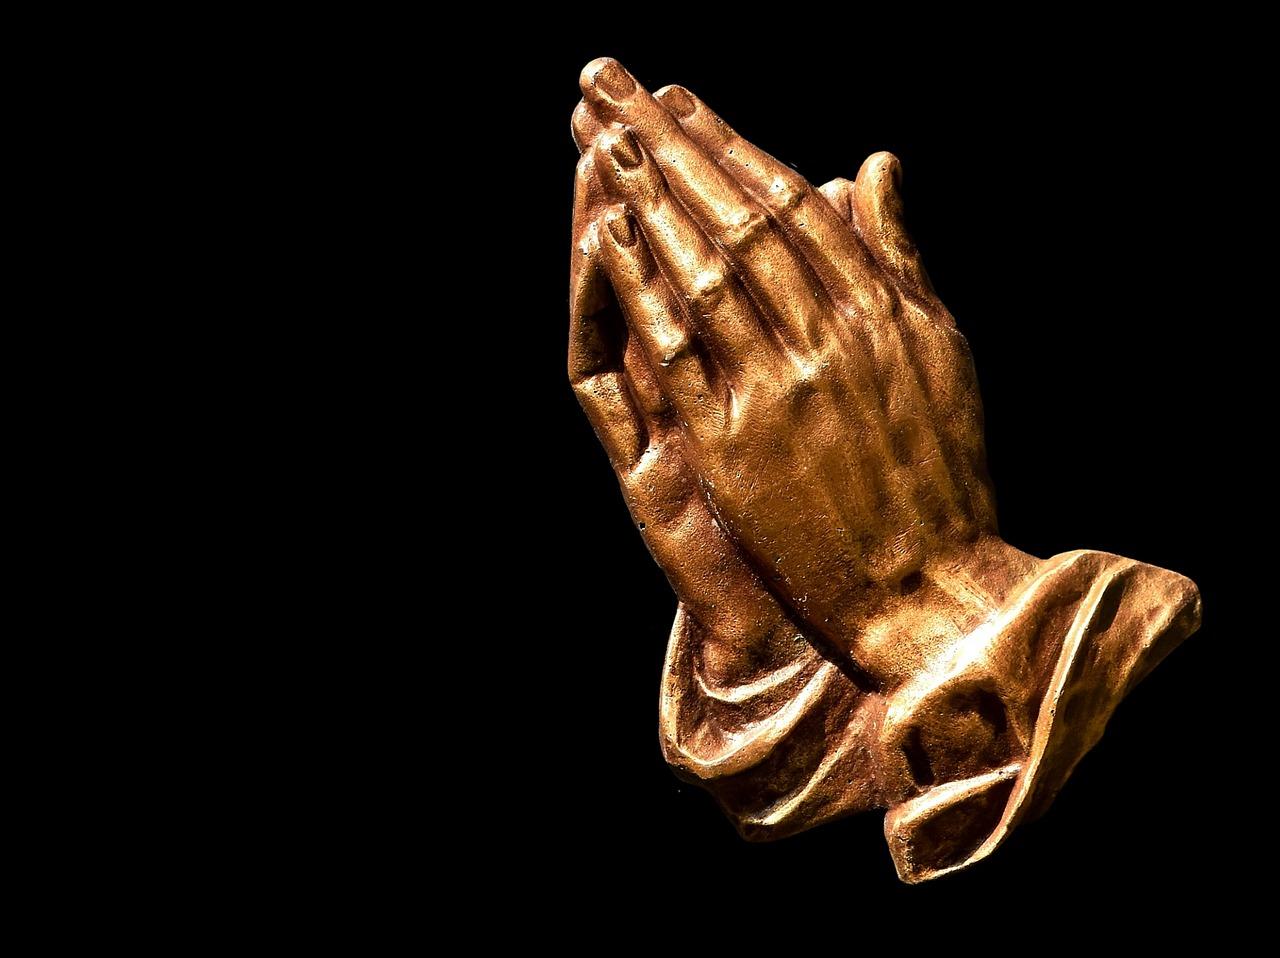 praying hands faith hope religion pray free photo from